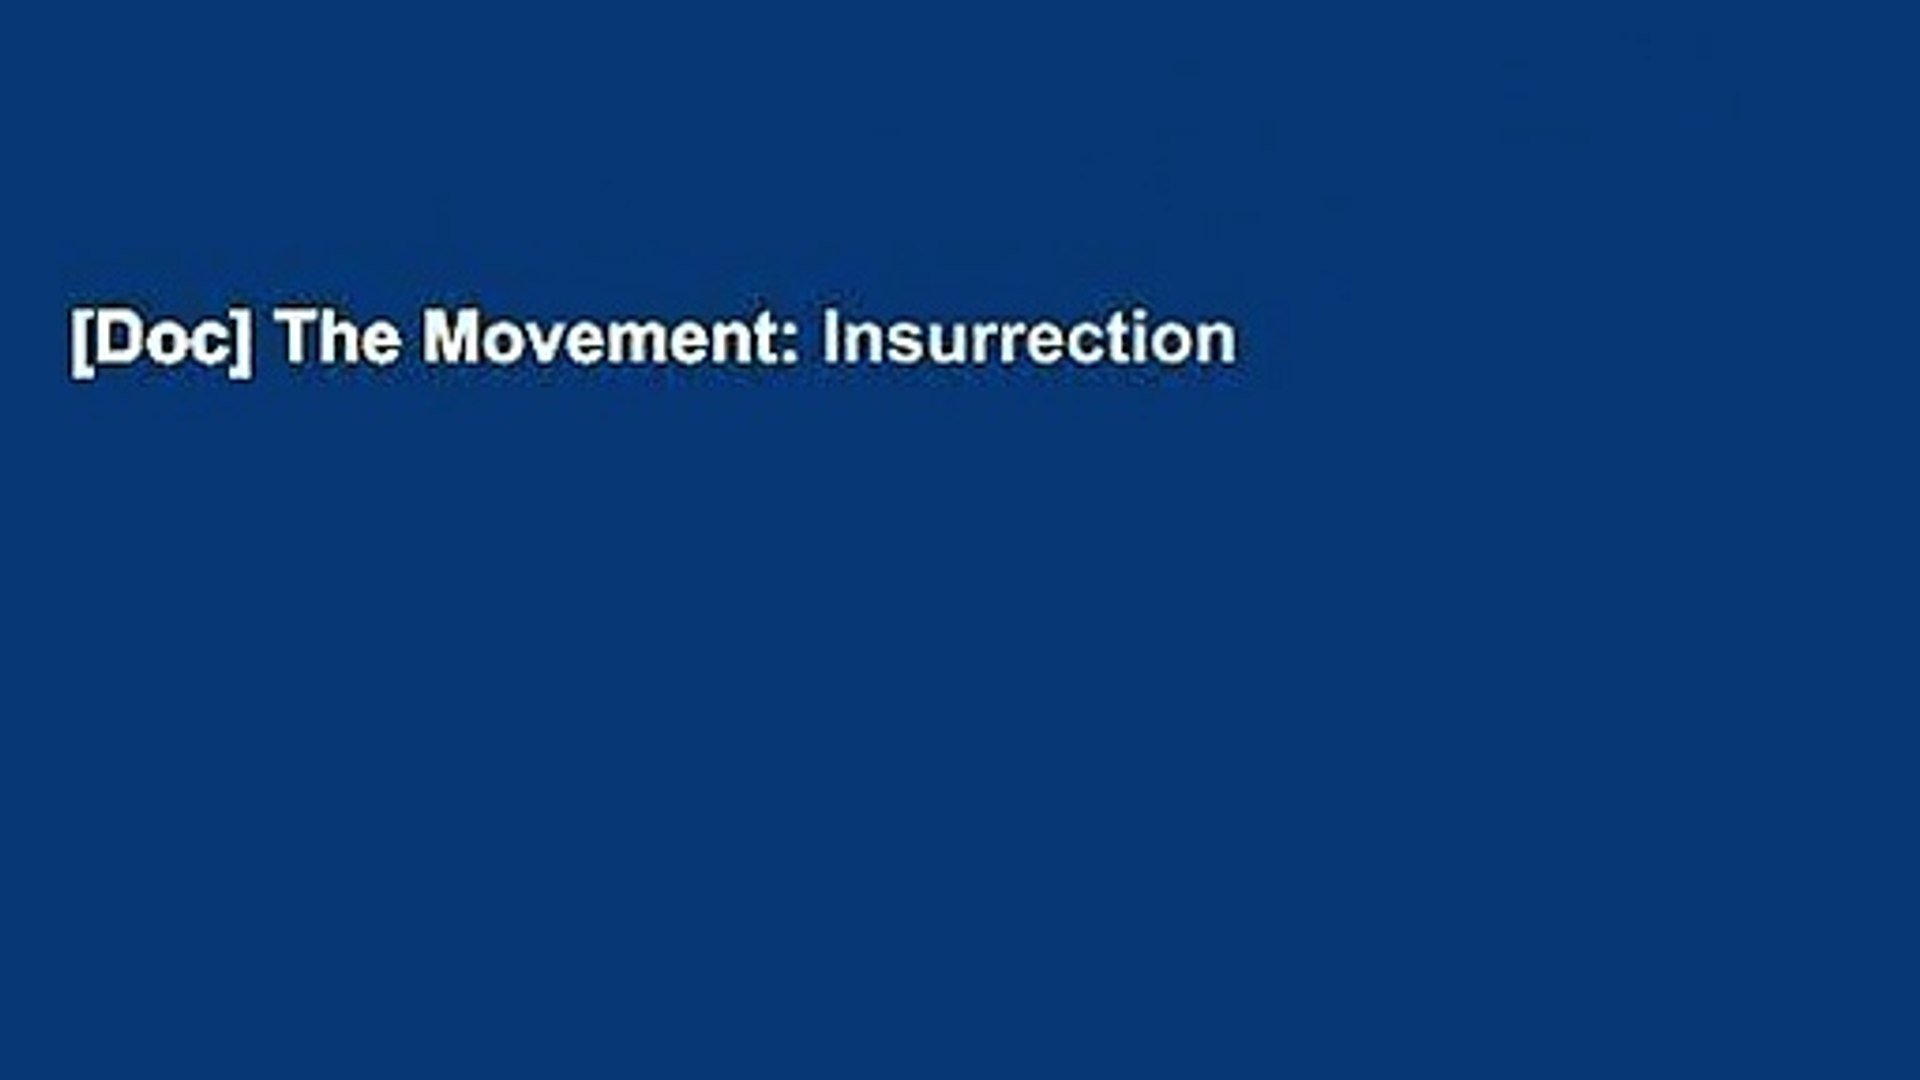 The Movement: Insurrection